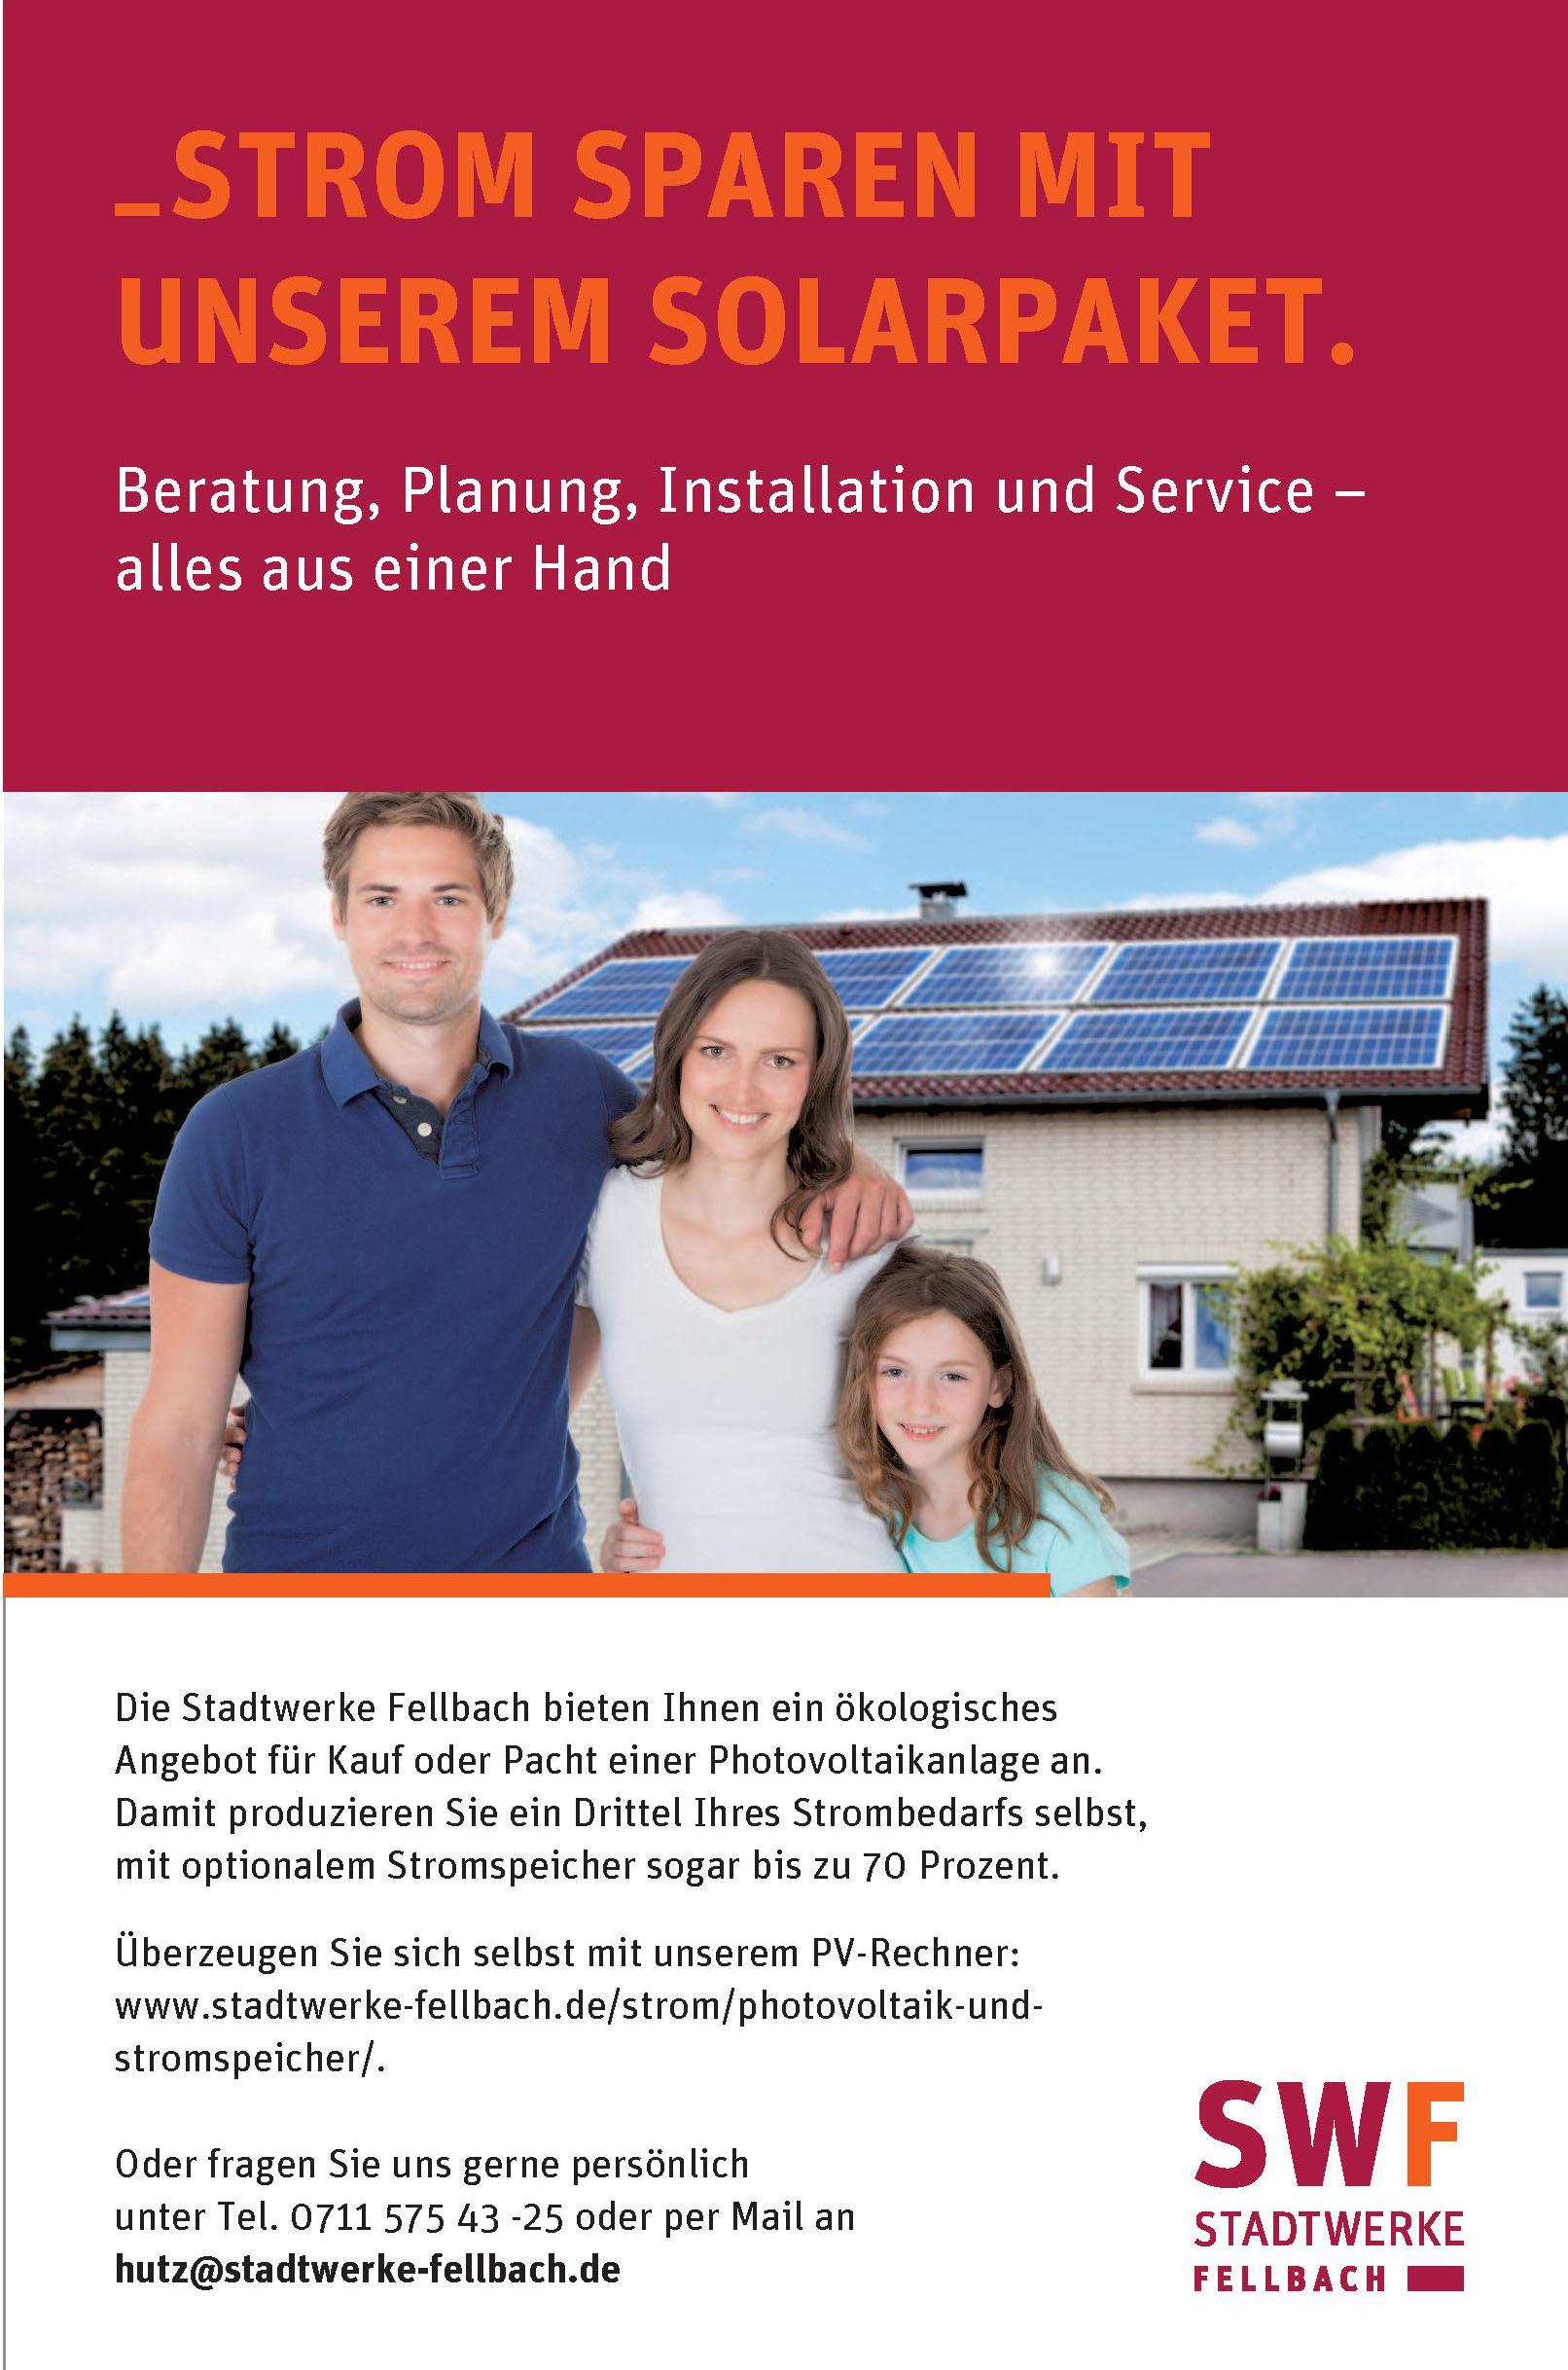 Stadtwerke Fellbach GmbH